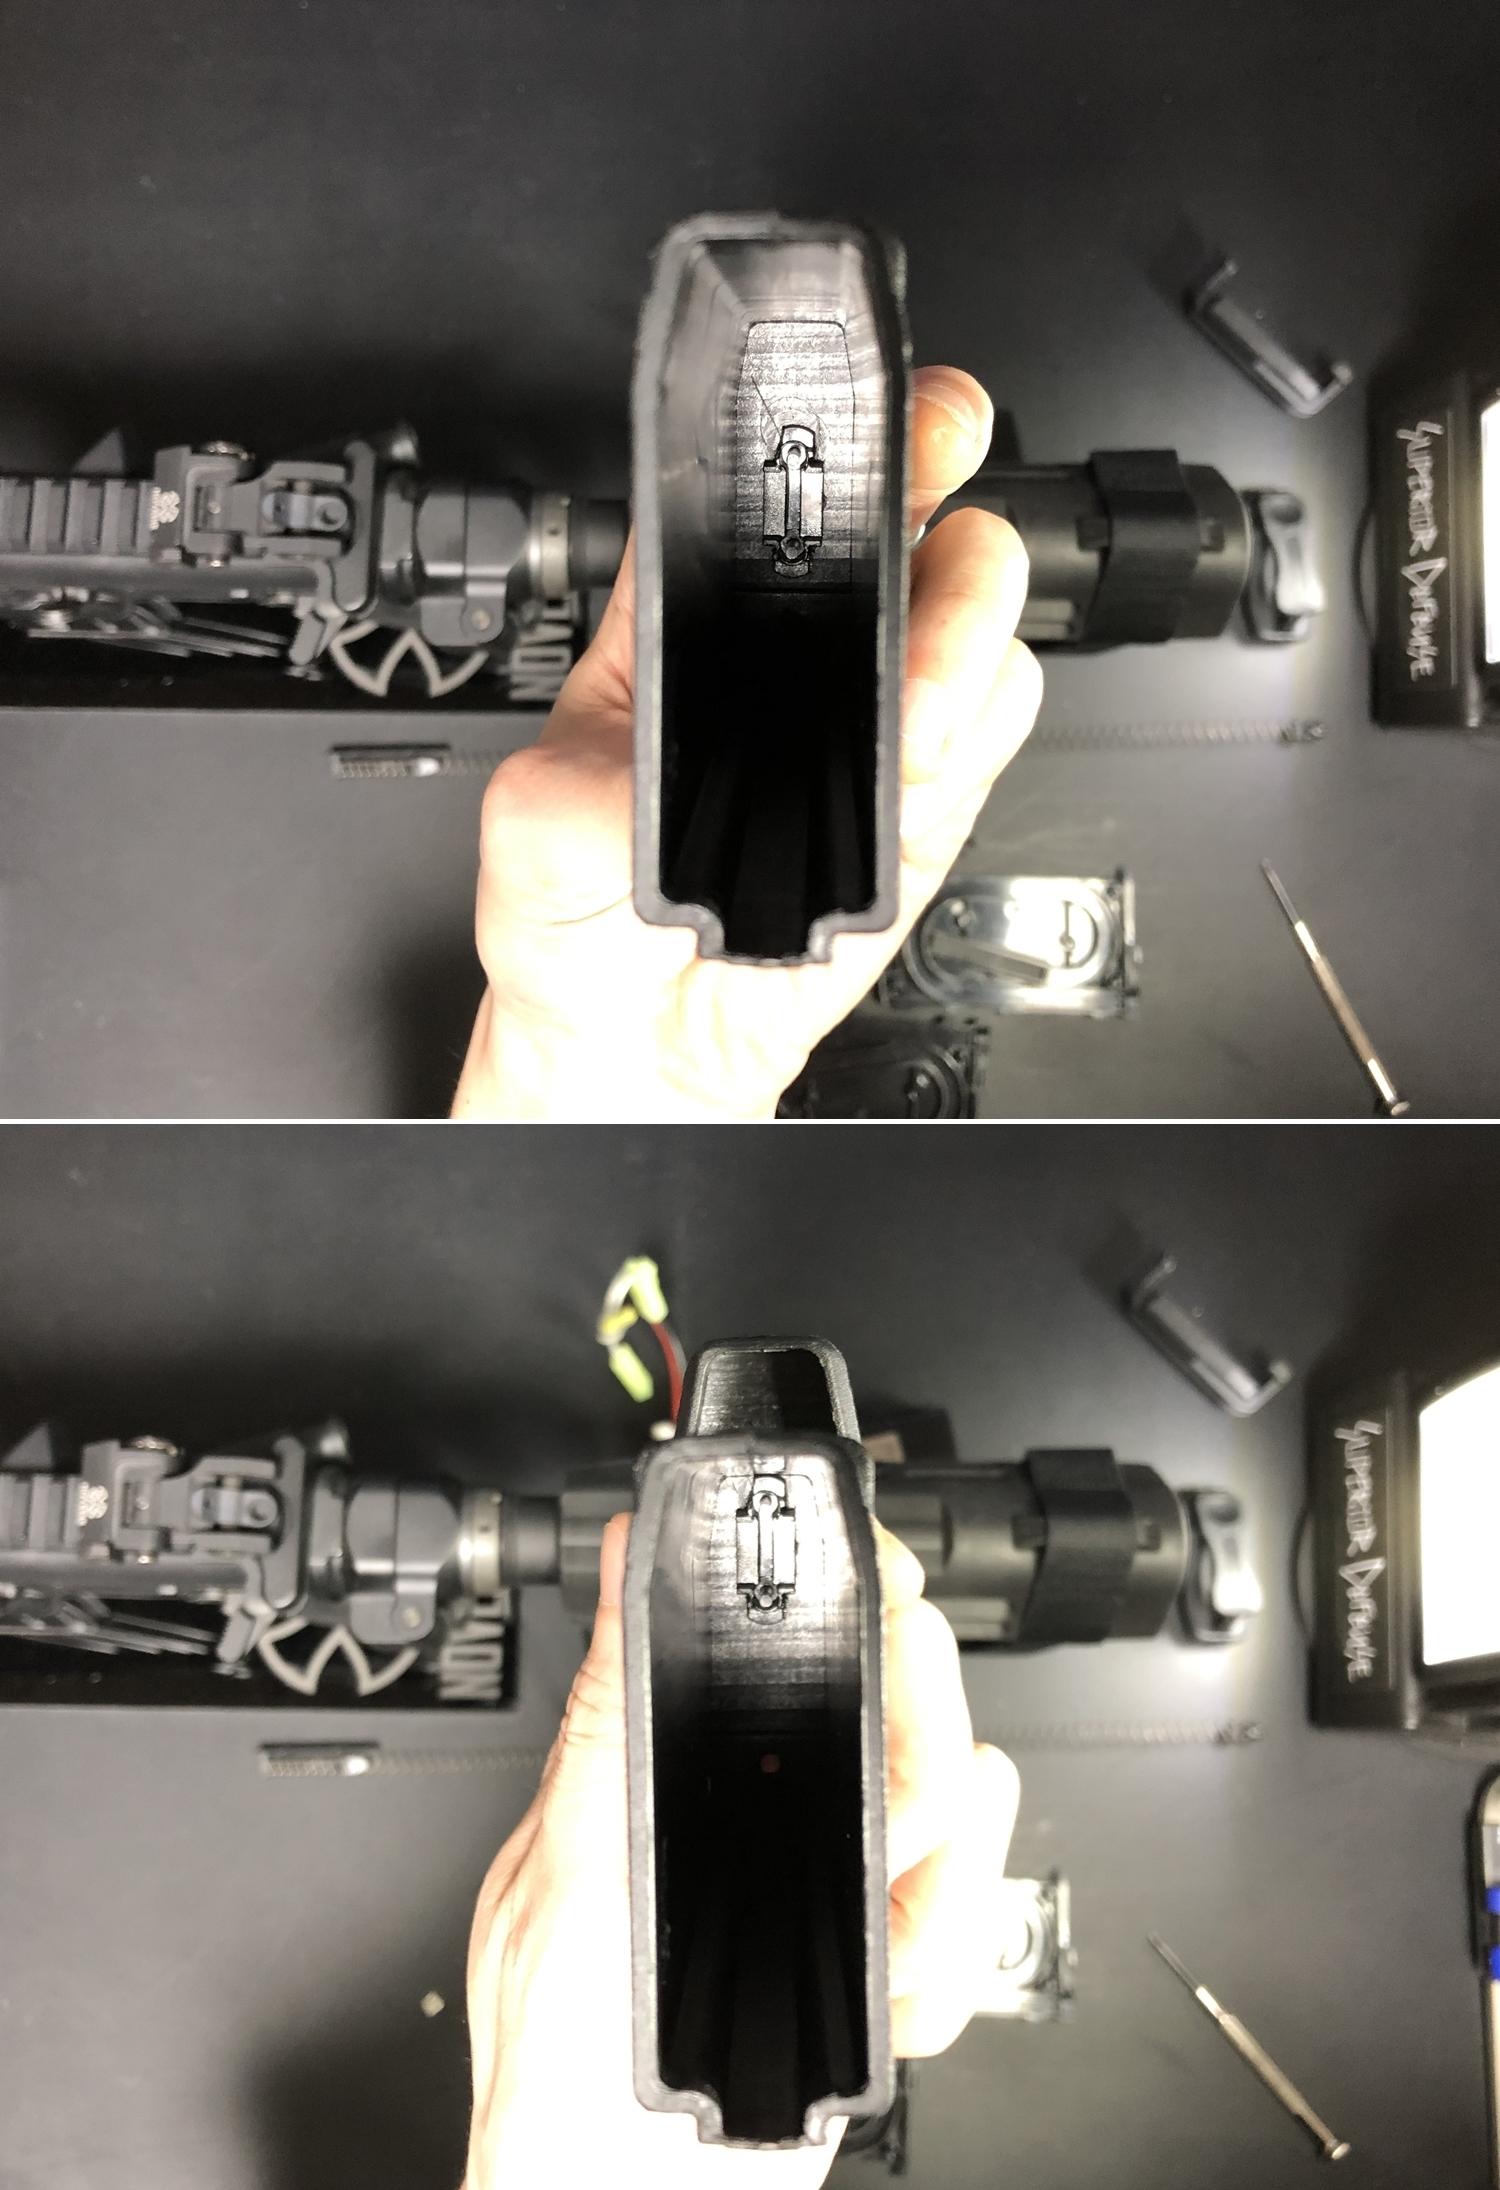 7 M4 P-MAG 20 ショートマガジン DIY 改造 外付け計画 第2弾 リポ バッテリーケース!! 実物 SB TACTICAL SBM4 SB-MAG20 へ装着だ!! 購入 改造 DIY 取付 レビュー!!